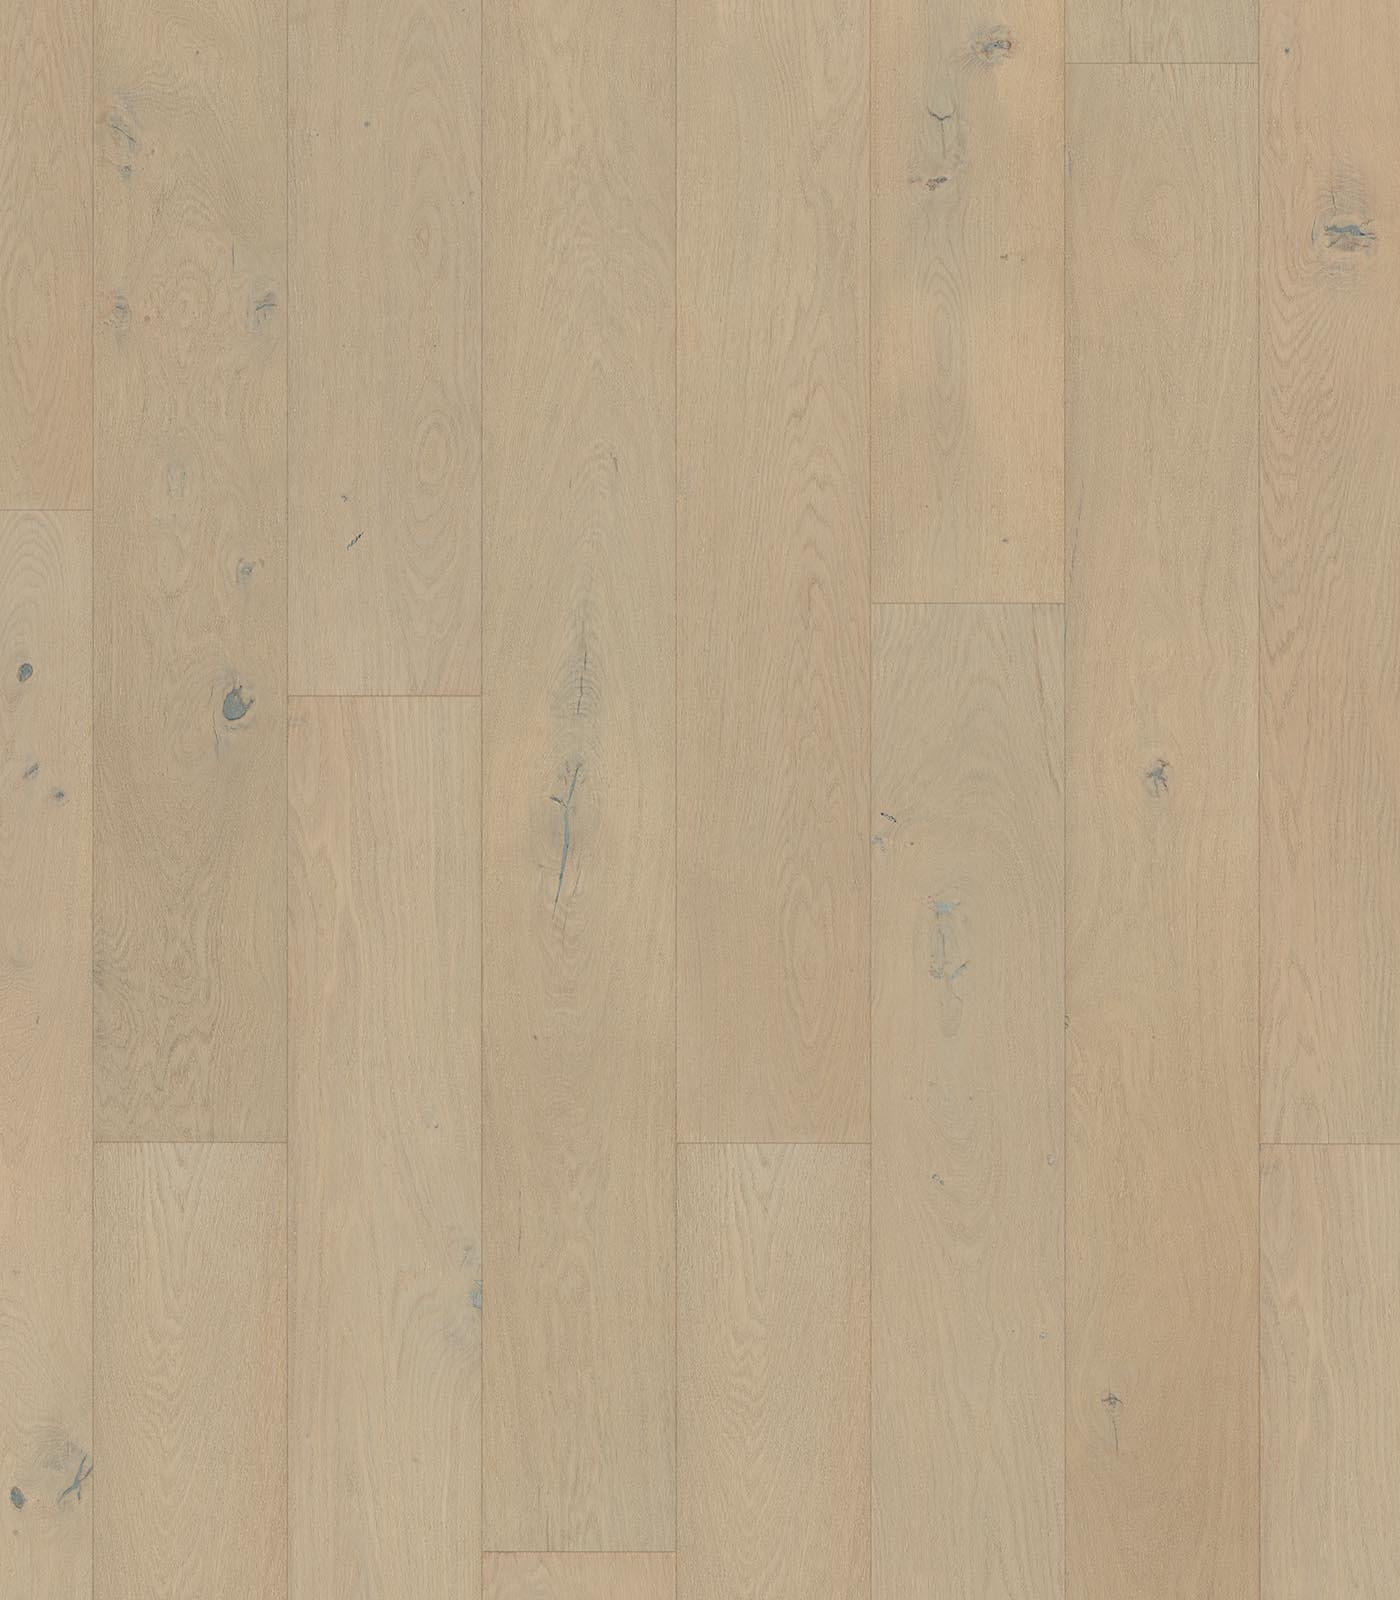 Puerto Rico-Island collection-European Oak floors-flat